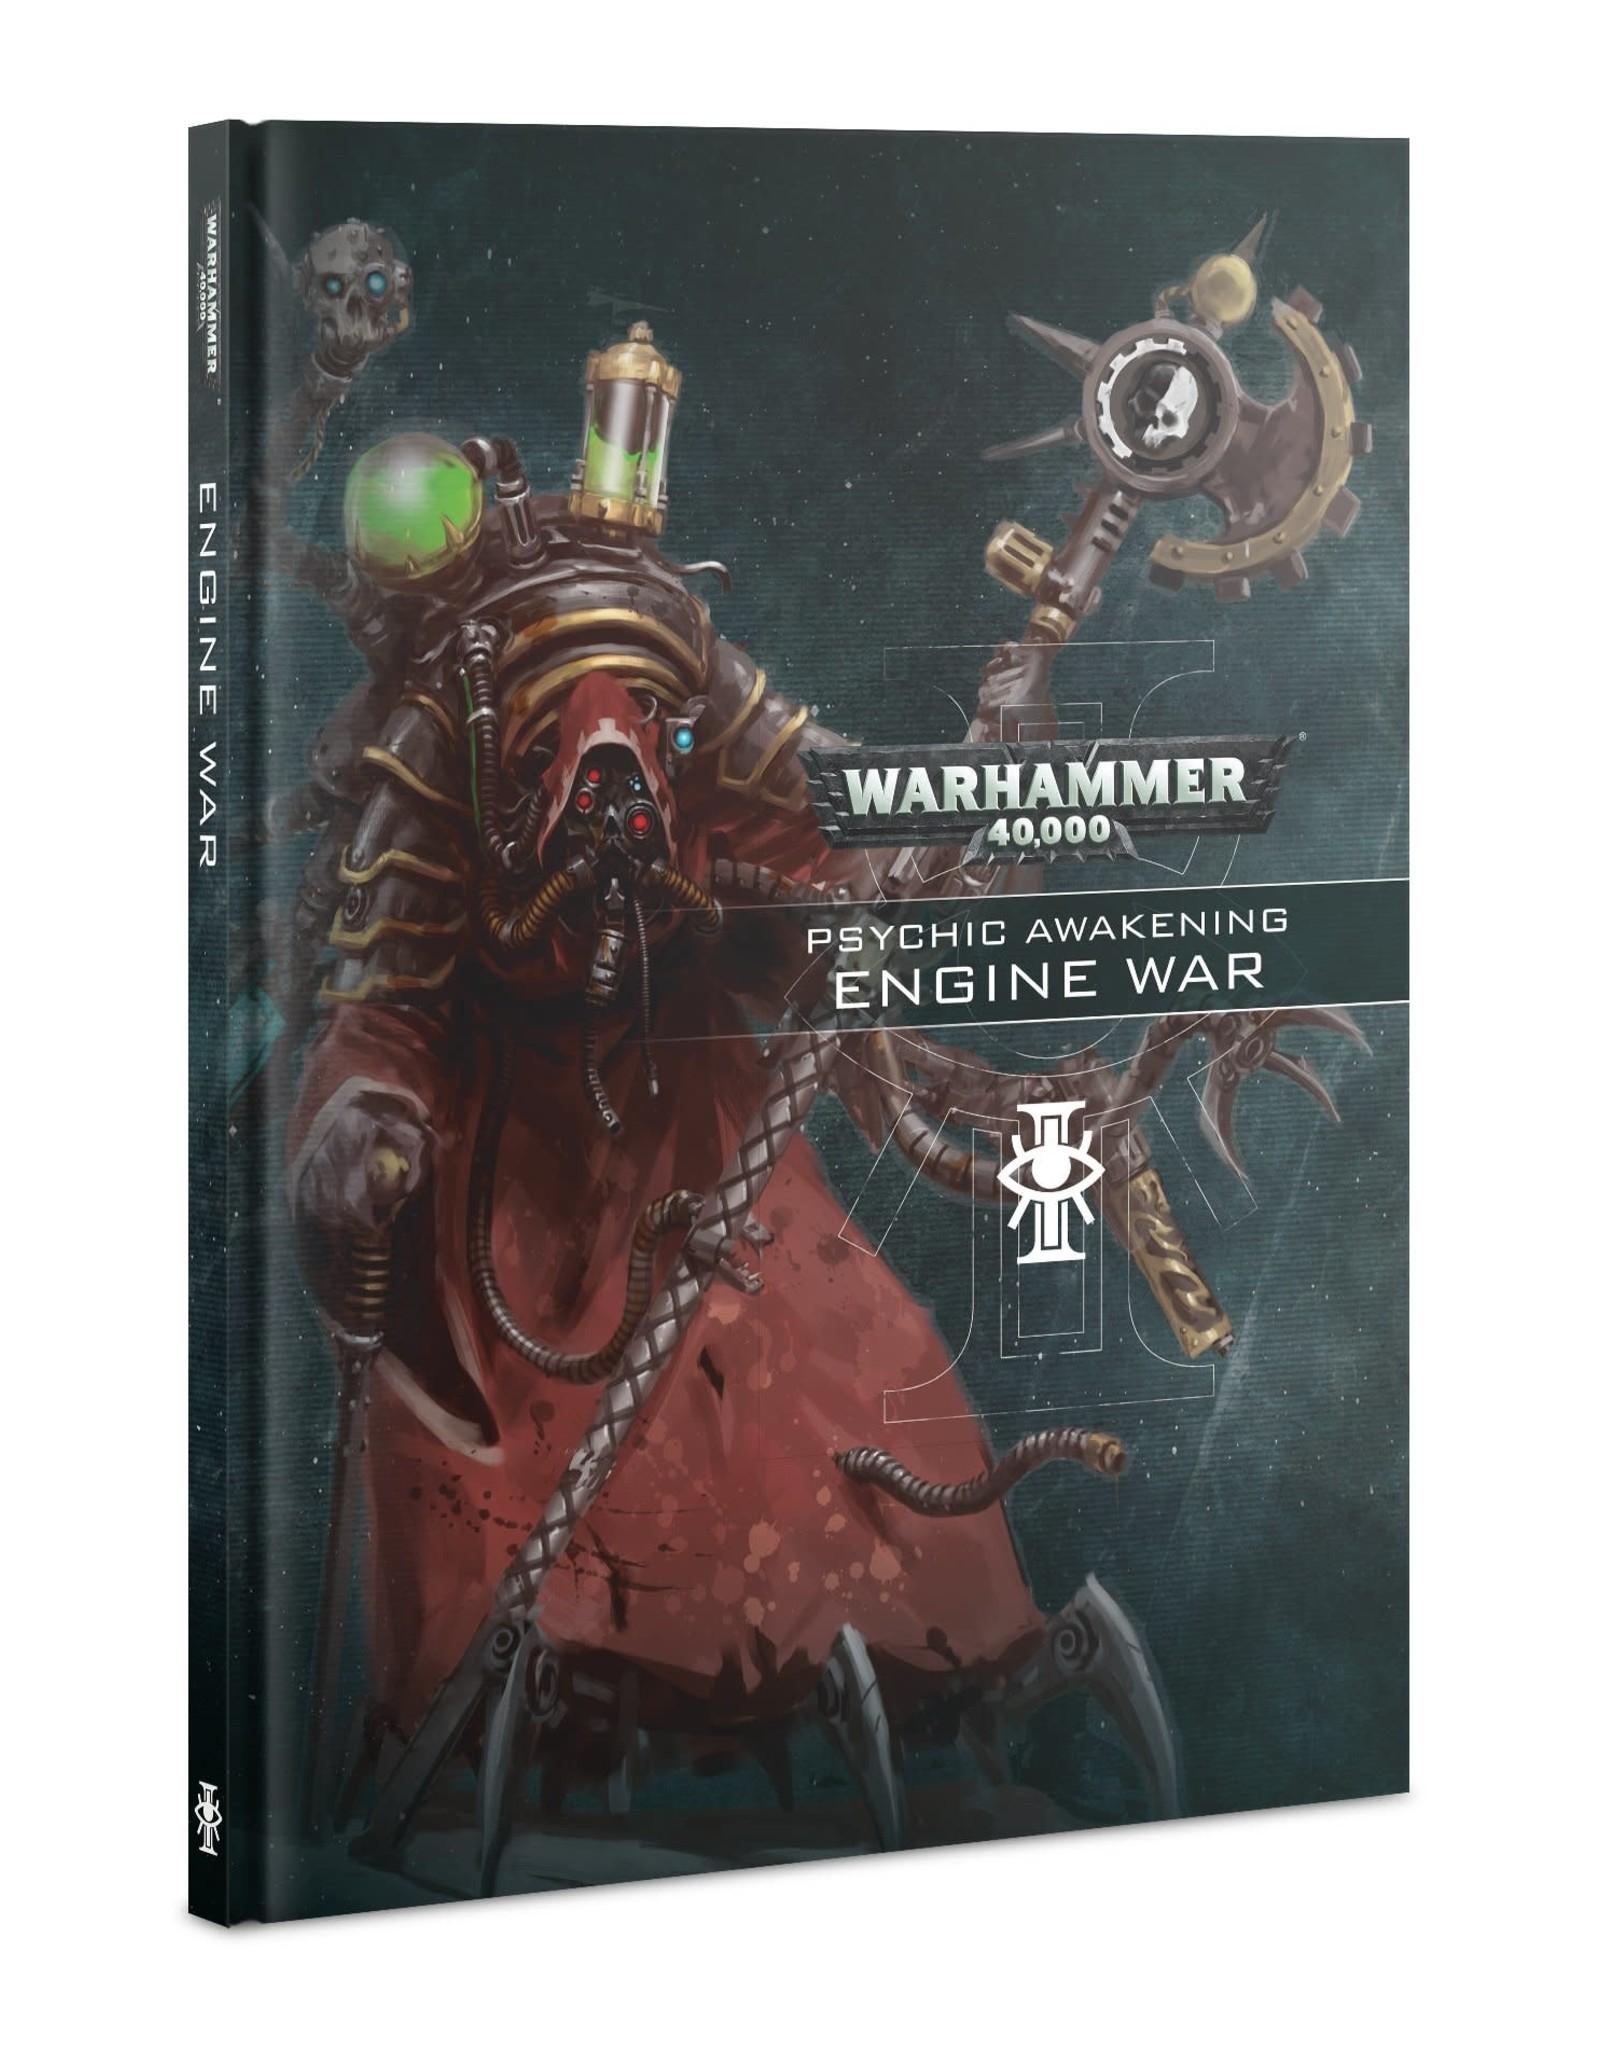 Warhammer 40k Engine War - Psychic Awakening Book 7